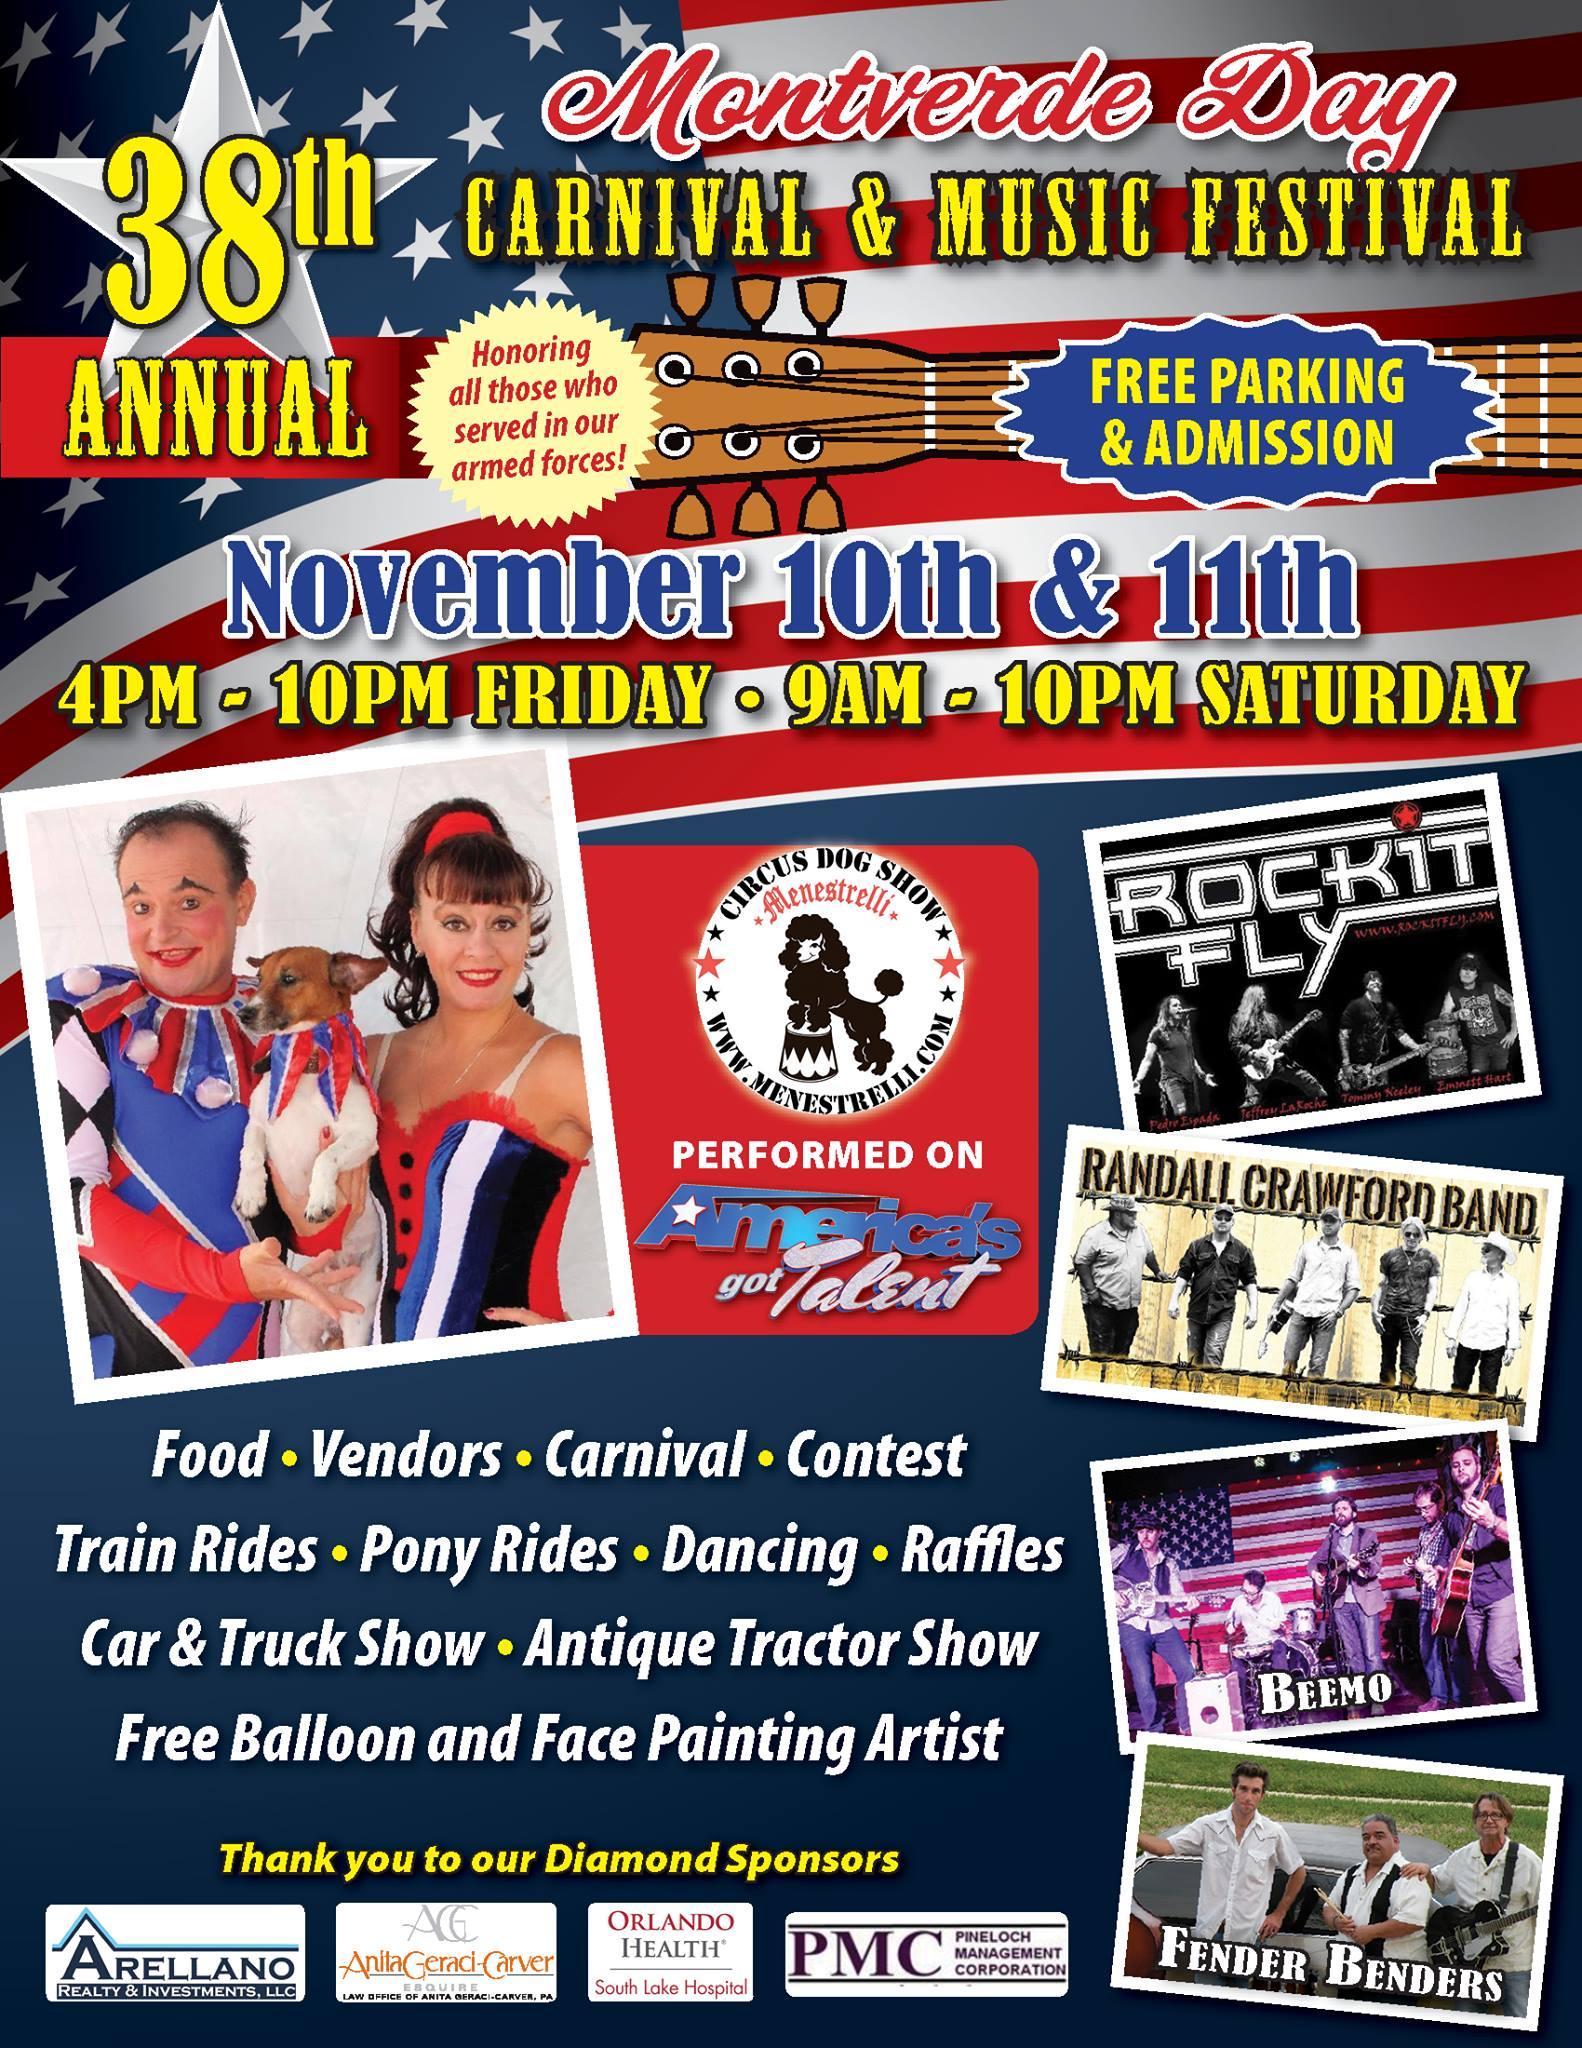 38th Annual Montverde Day Nov 10 & 11th